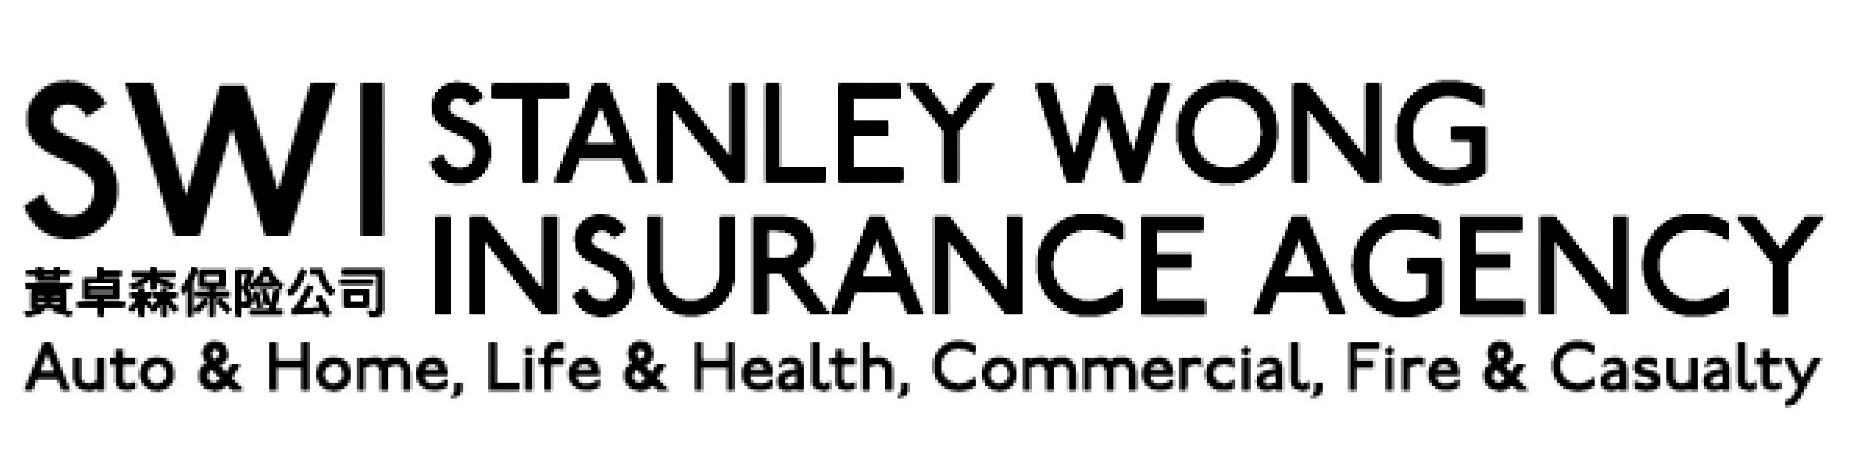 Stanley Wong Insurance Agency logo